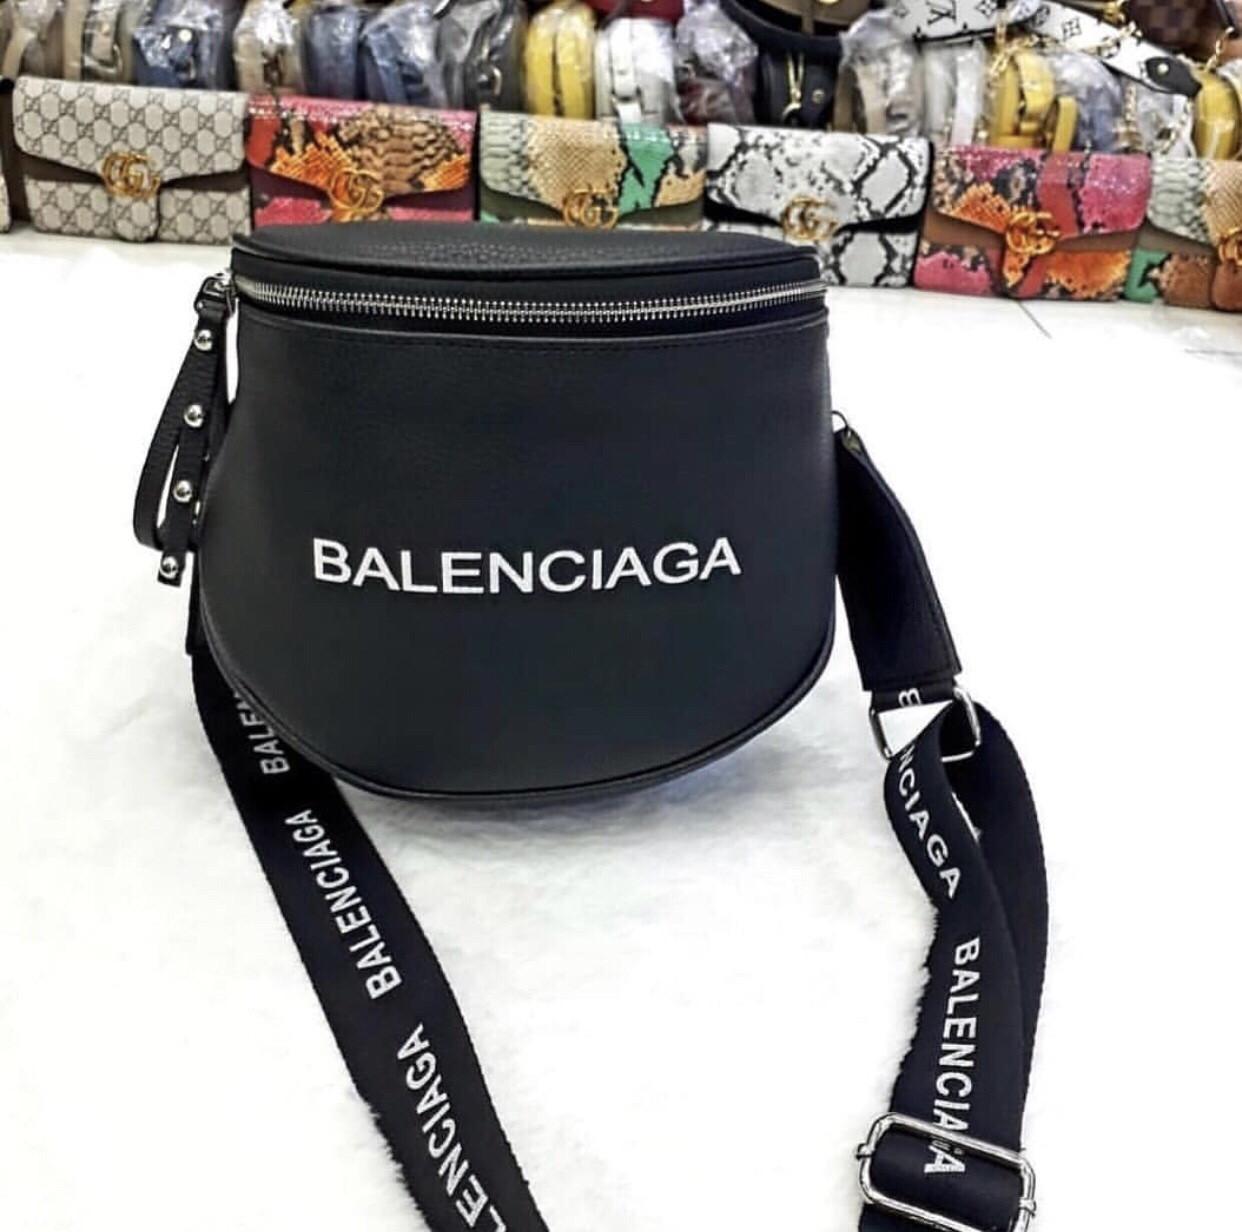 Сумка  Balenciaga бананка трансформер (реплика Баленсиага люкс) black